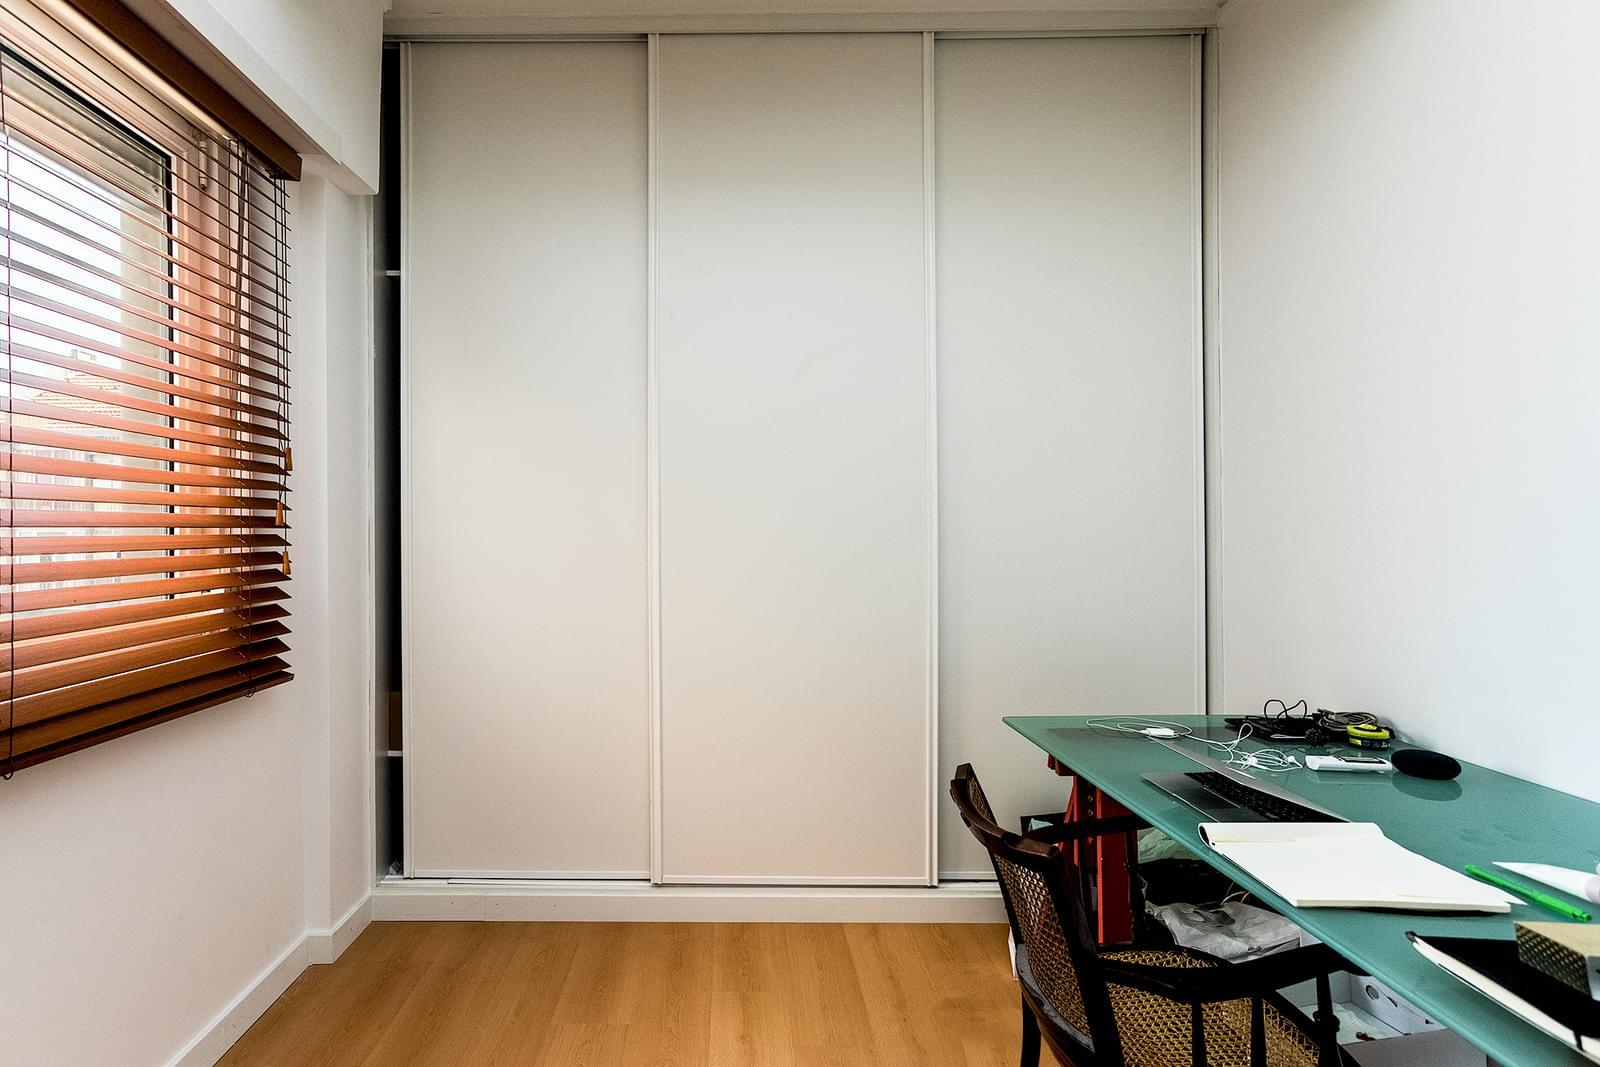 pf17340-apartamento-t3-lisboa-79562b6f-6fbd-4218-8944-2990a177f4b1